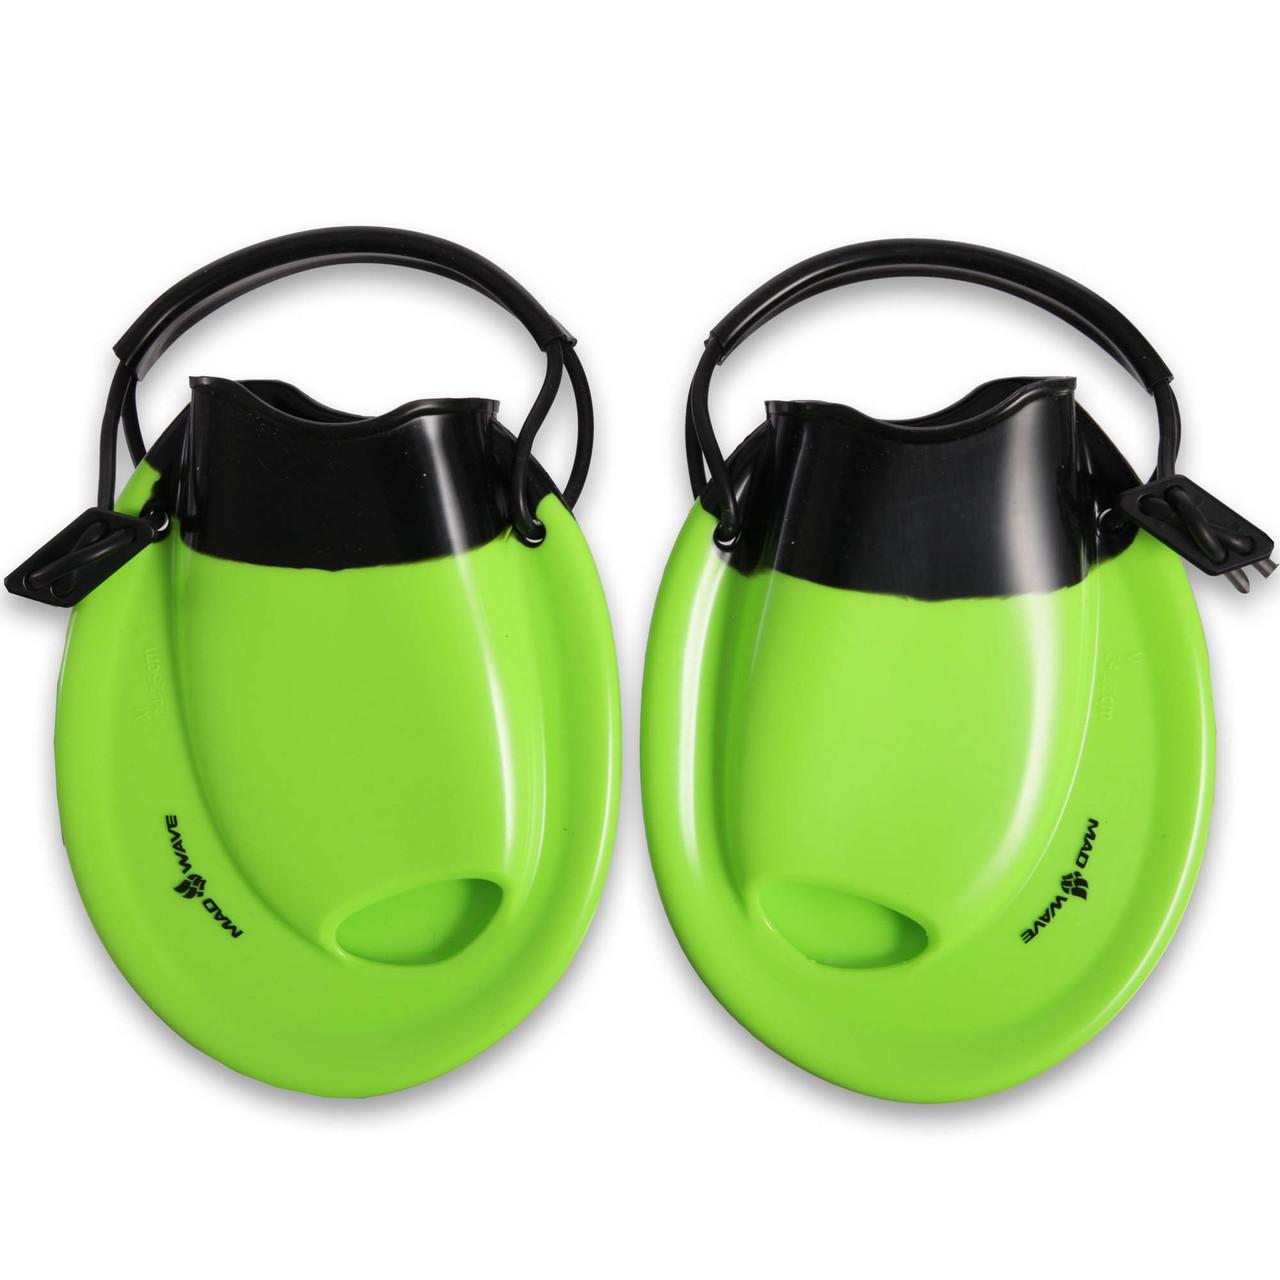 Ласти для брасса planeta-sport MadWave Positive Drive M074101 40-41 Зелений